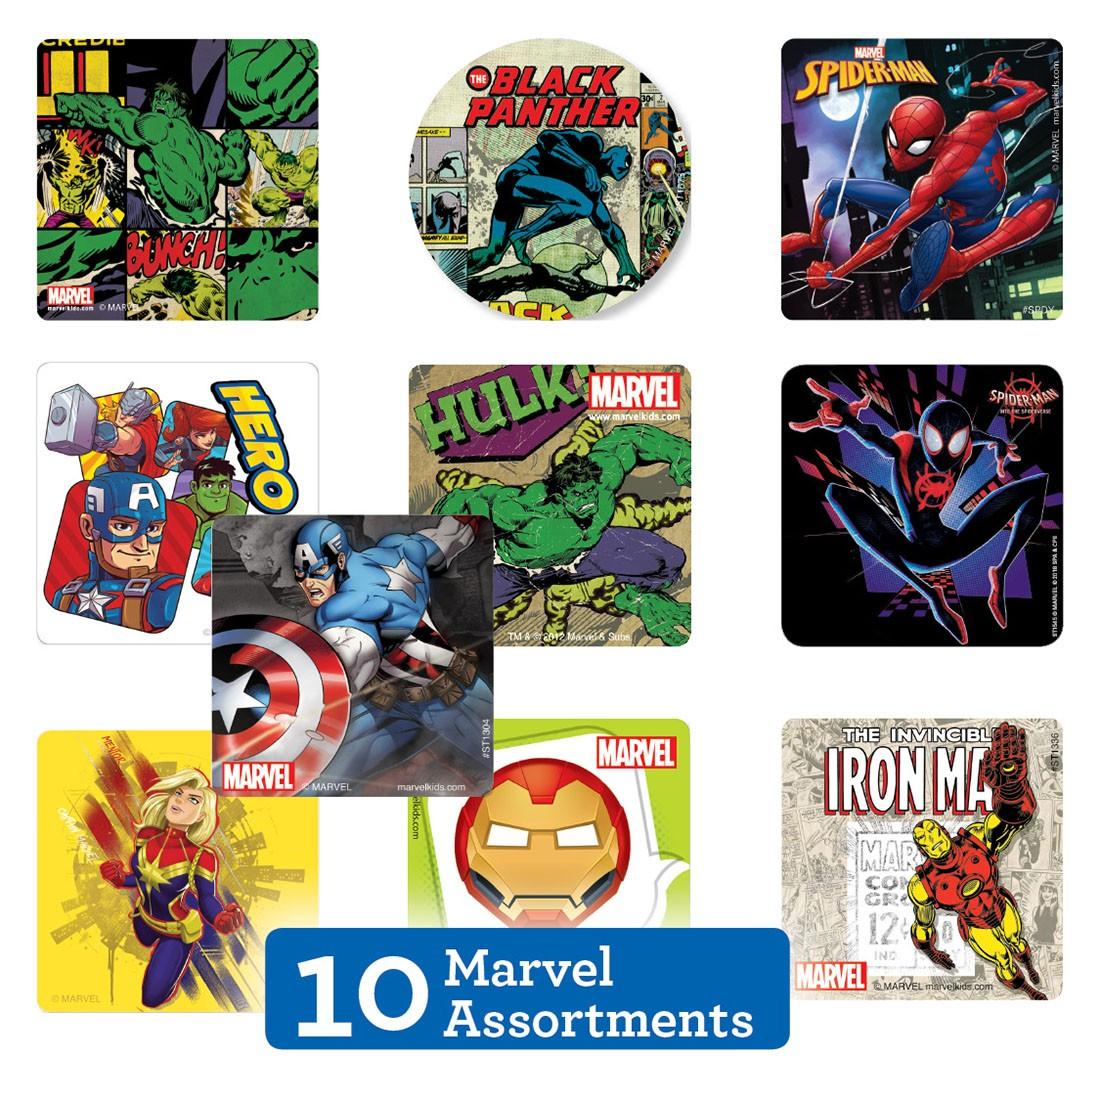 Marvel Sticker Sampler [image]